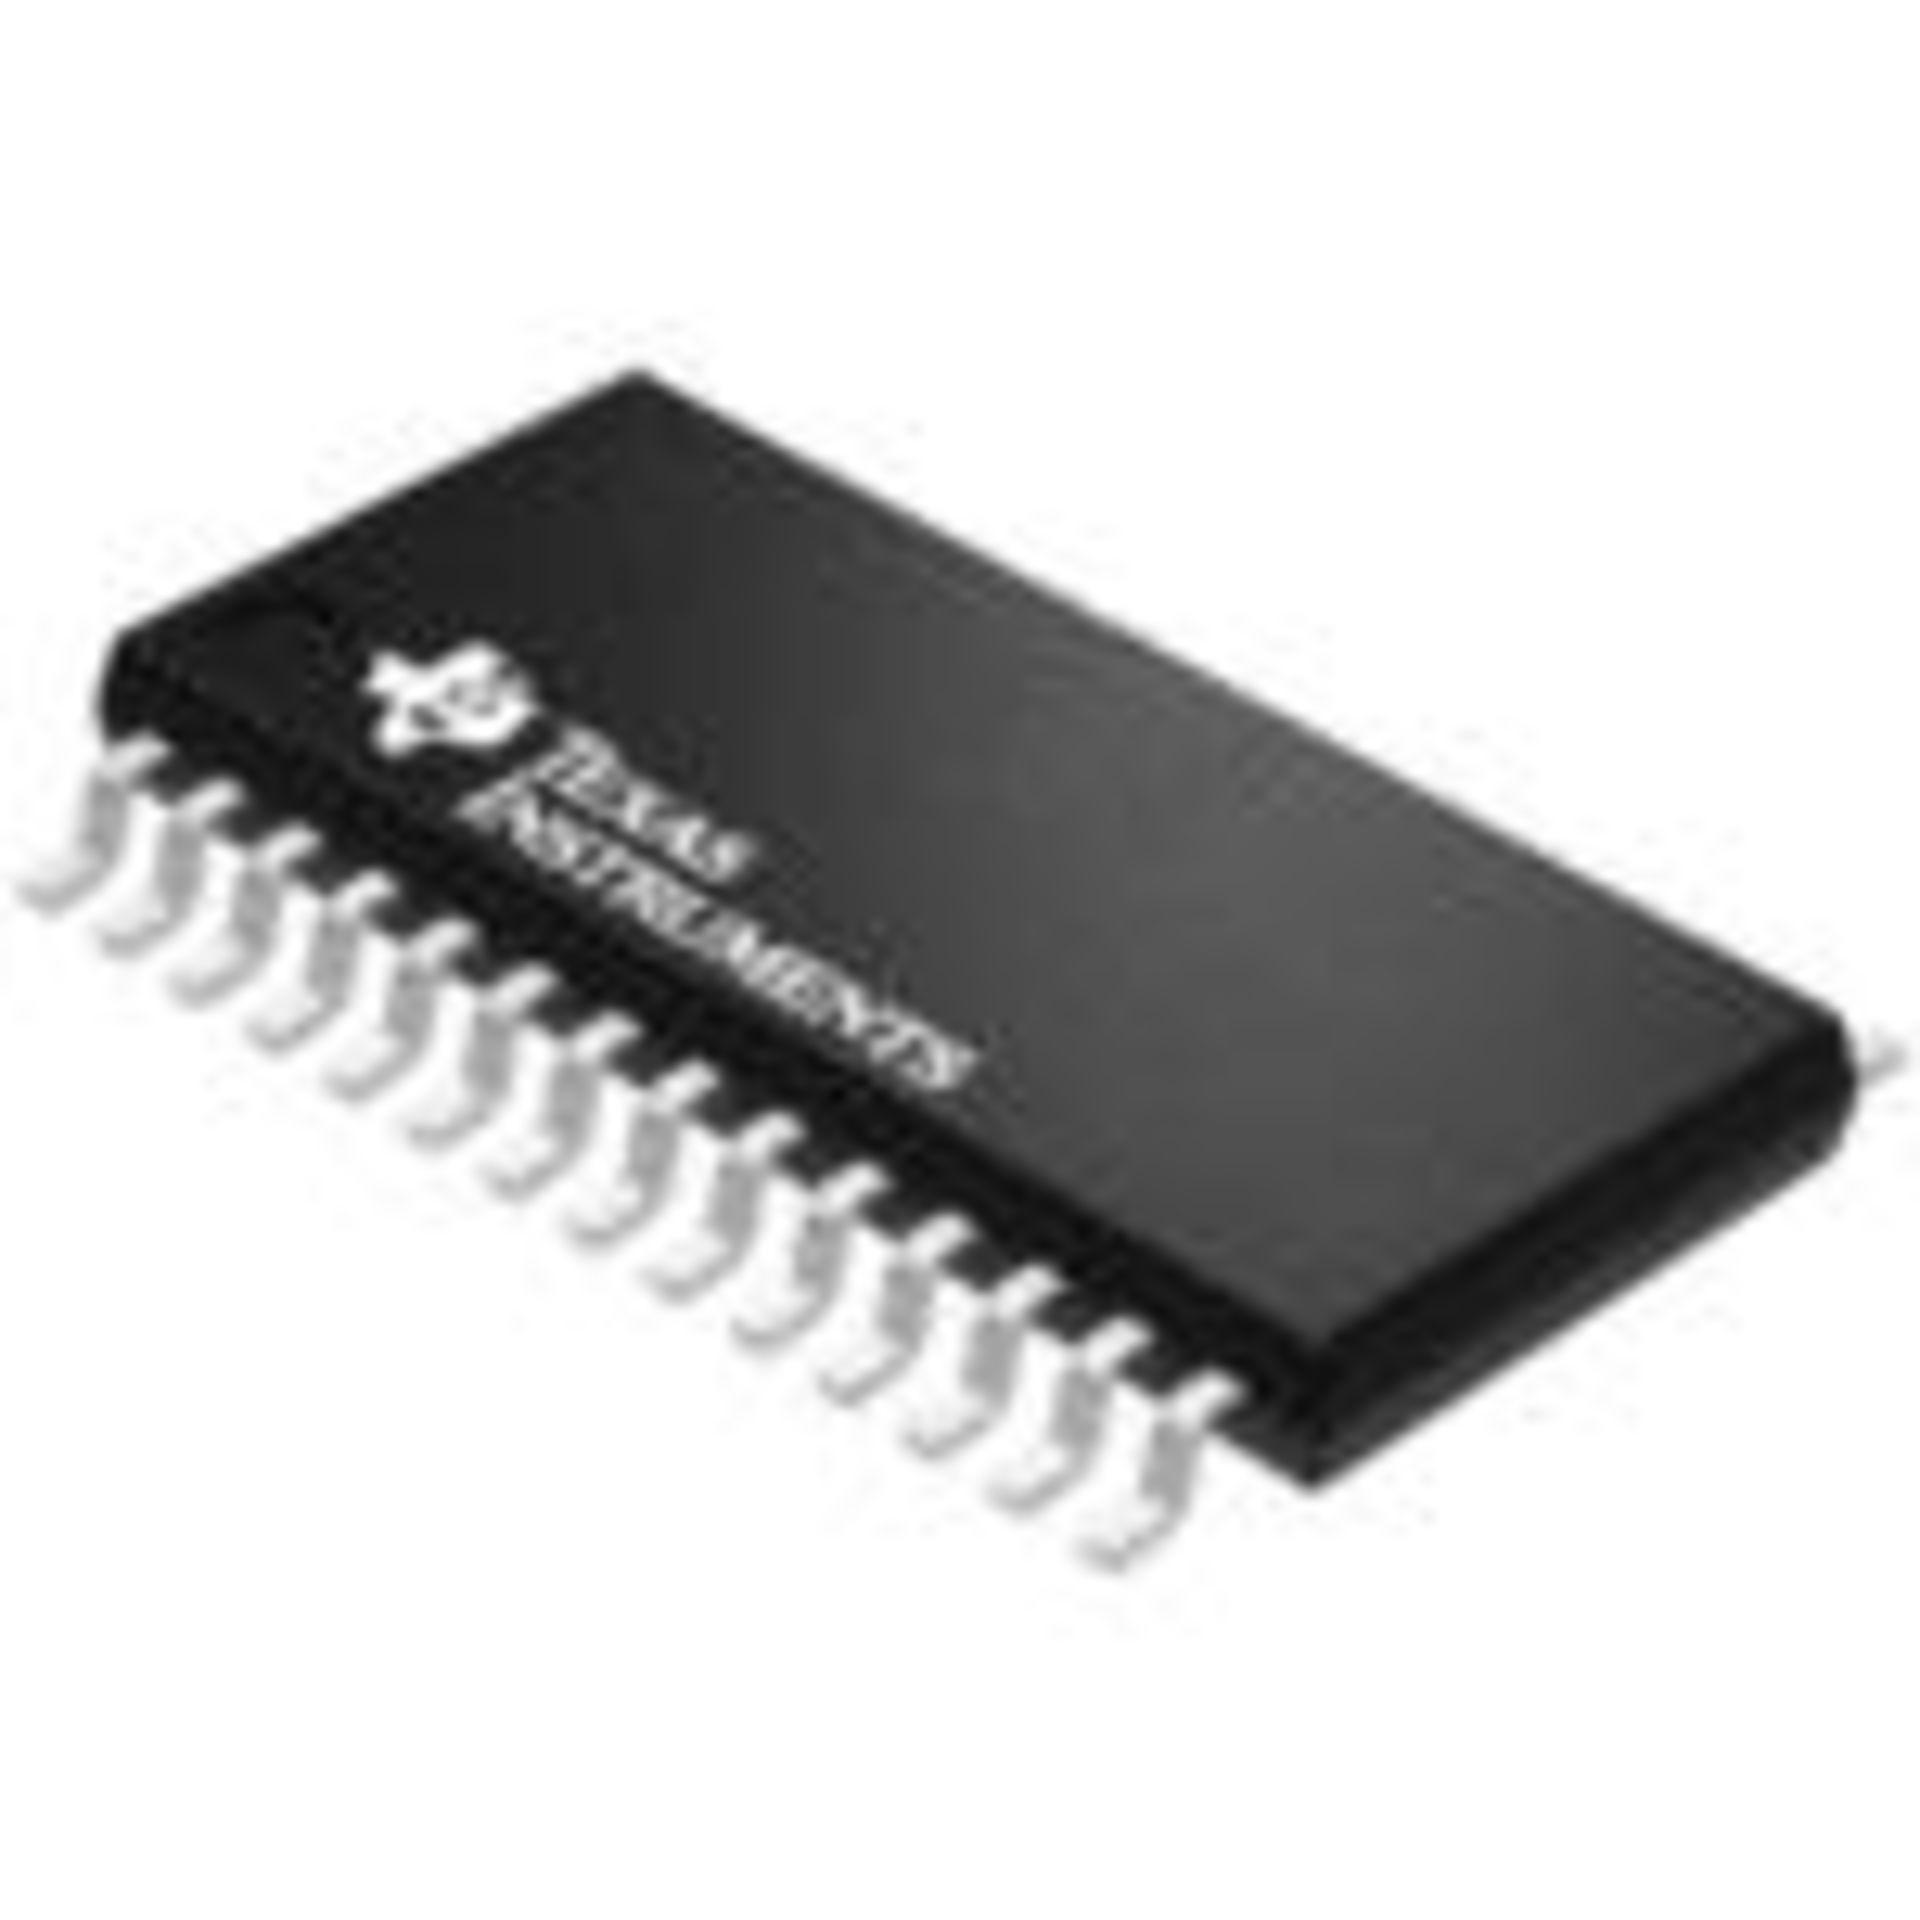 Texas Instruments DS90LV110TMTC, LVDS Receiver 800Mbps 0.45V 28-Pin TSSOP Tube, QTY 86